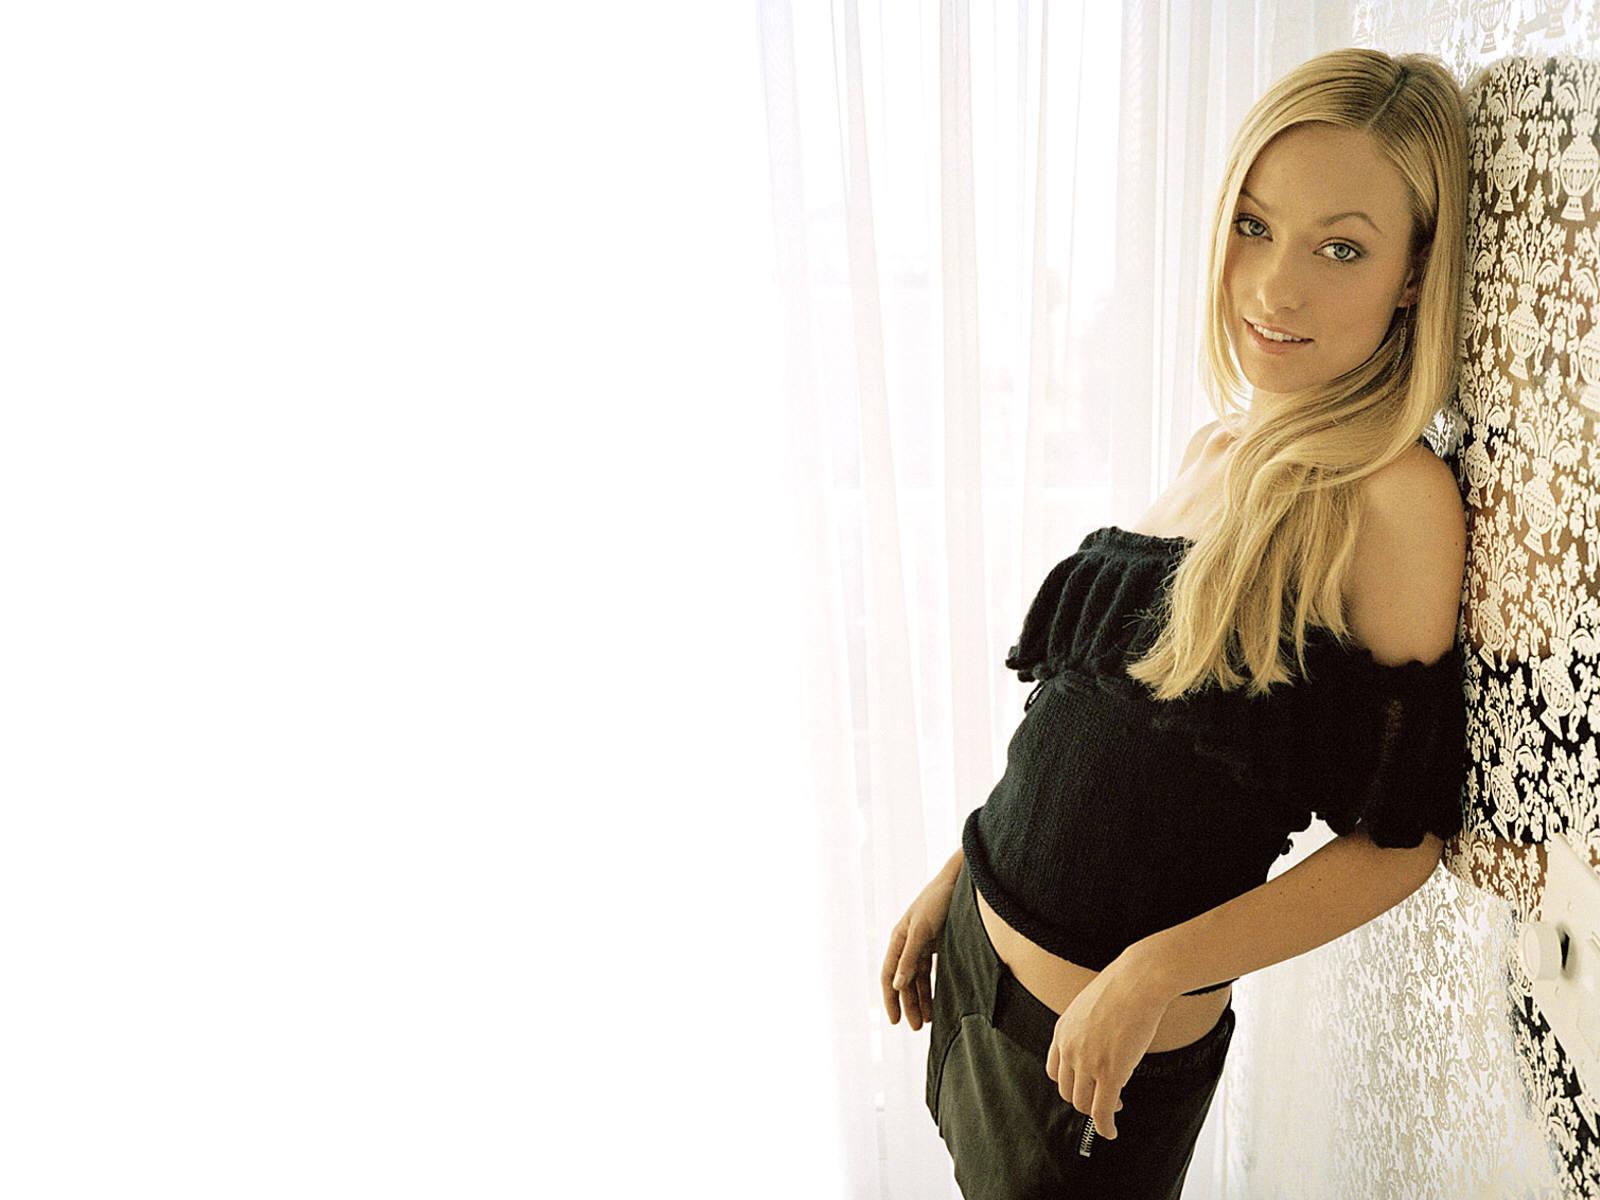 http://1.bp.blogspot.com/_Q_MQFtopsfY/SHYRtr0-m8I/AAAAAAAADOs/YsMVbW5Ebos/s1600/Fullwalls.blogspot.com_Olivia_Wilde(23).jpg